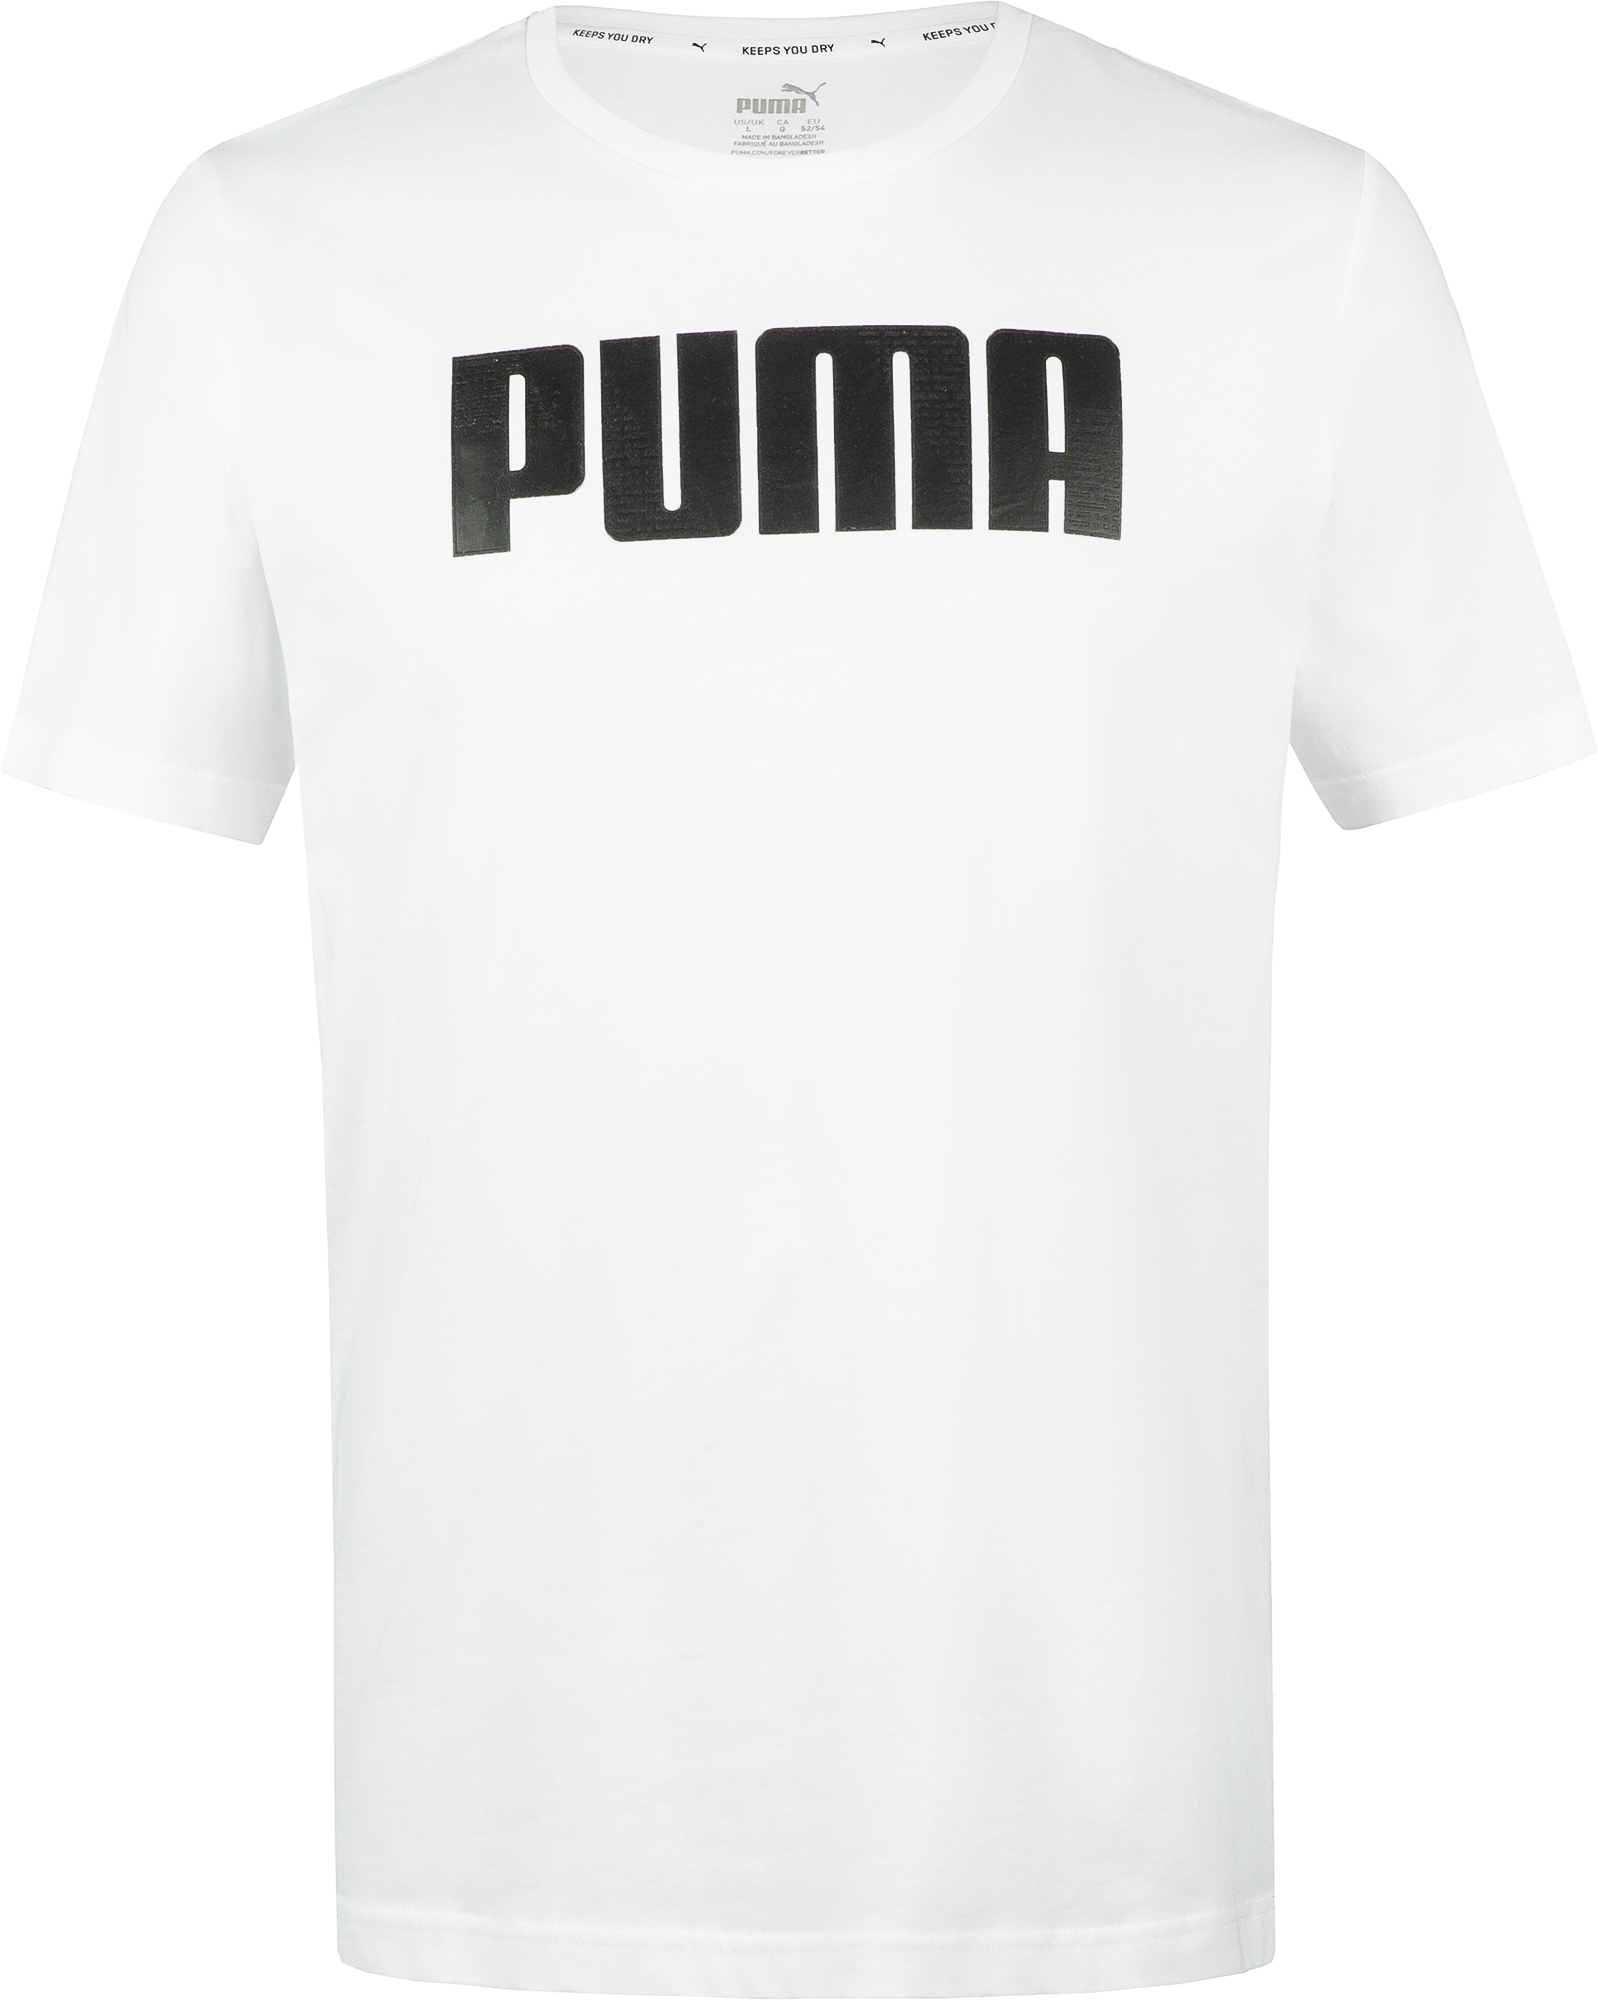 PUMA Футболка мужская Puma Active, размер 52-54 футболка мужская mavi цвет белый 065283 620 размер xxl 54